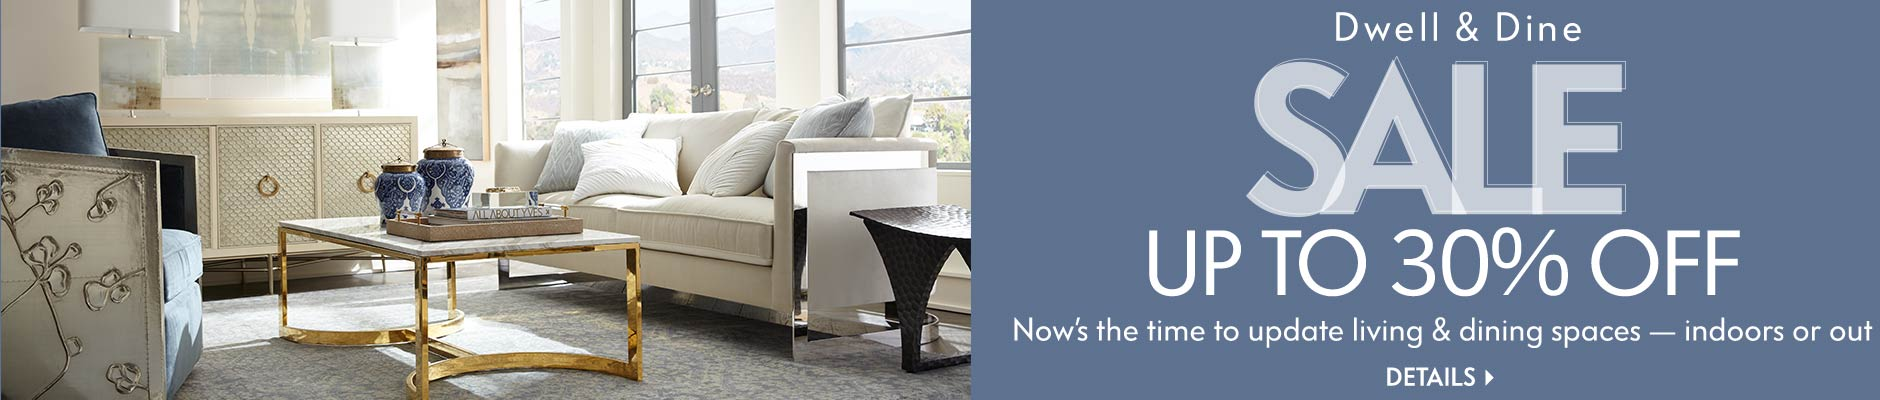 pics of living room furniture. Living Room Pics Of Furniture